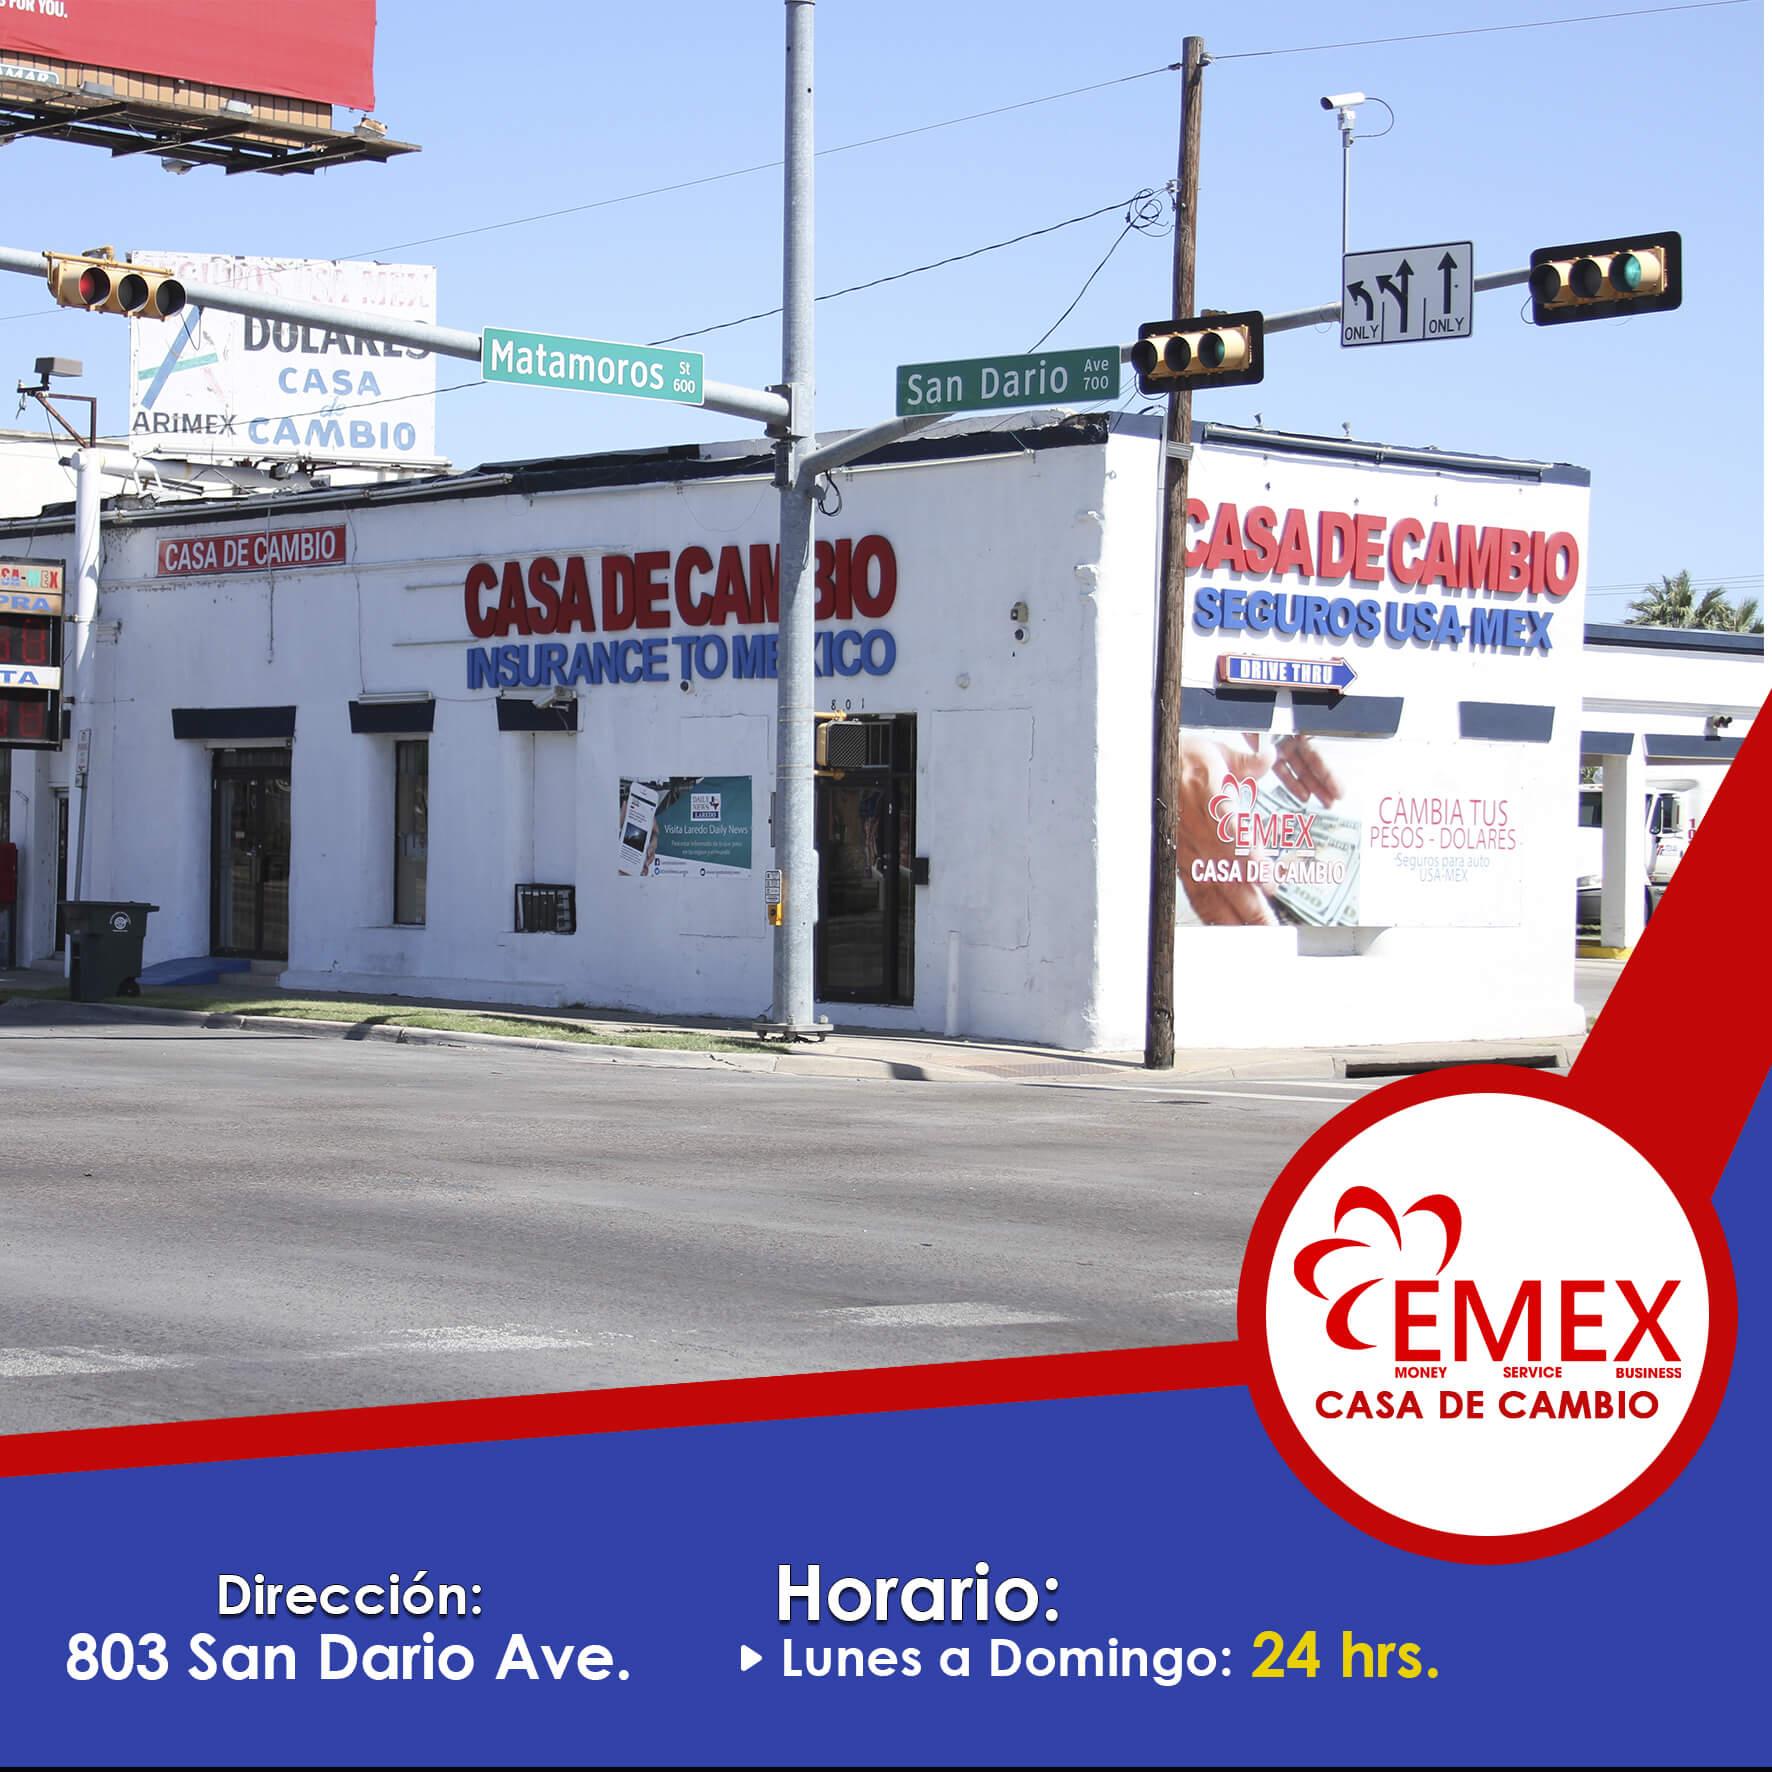 Emex (803 San Dario Ave)